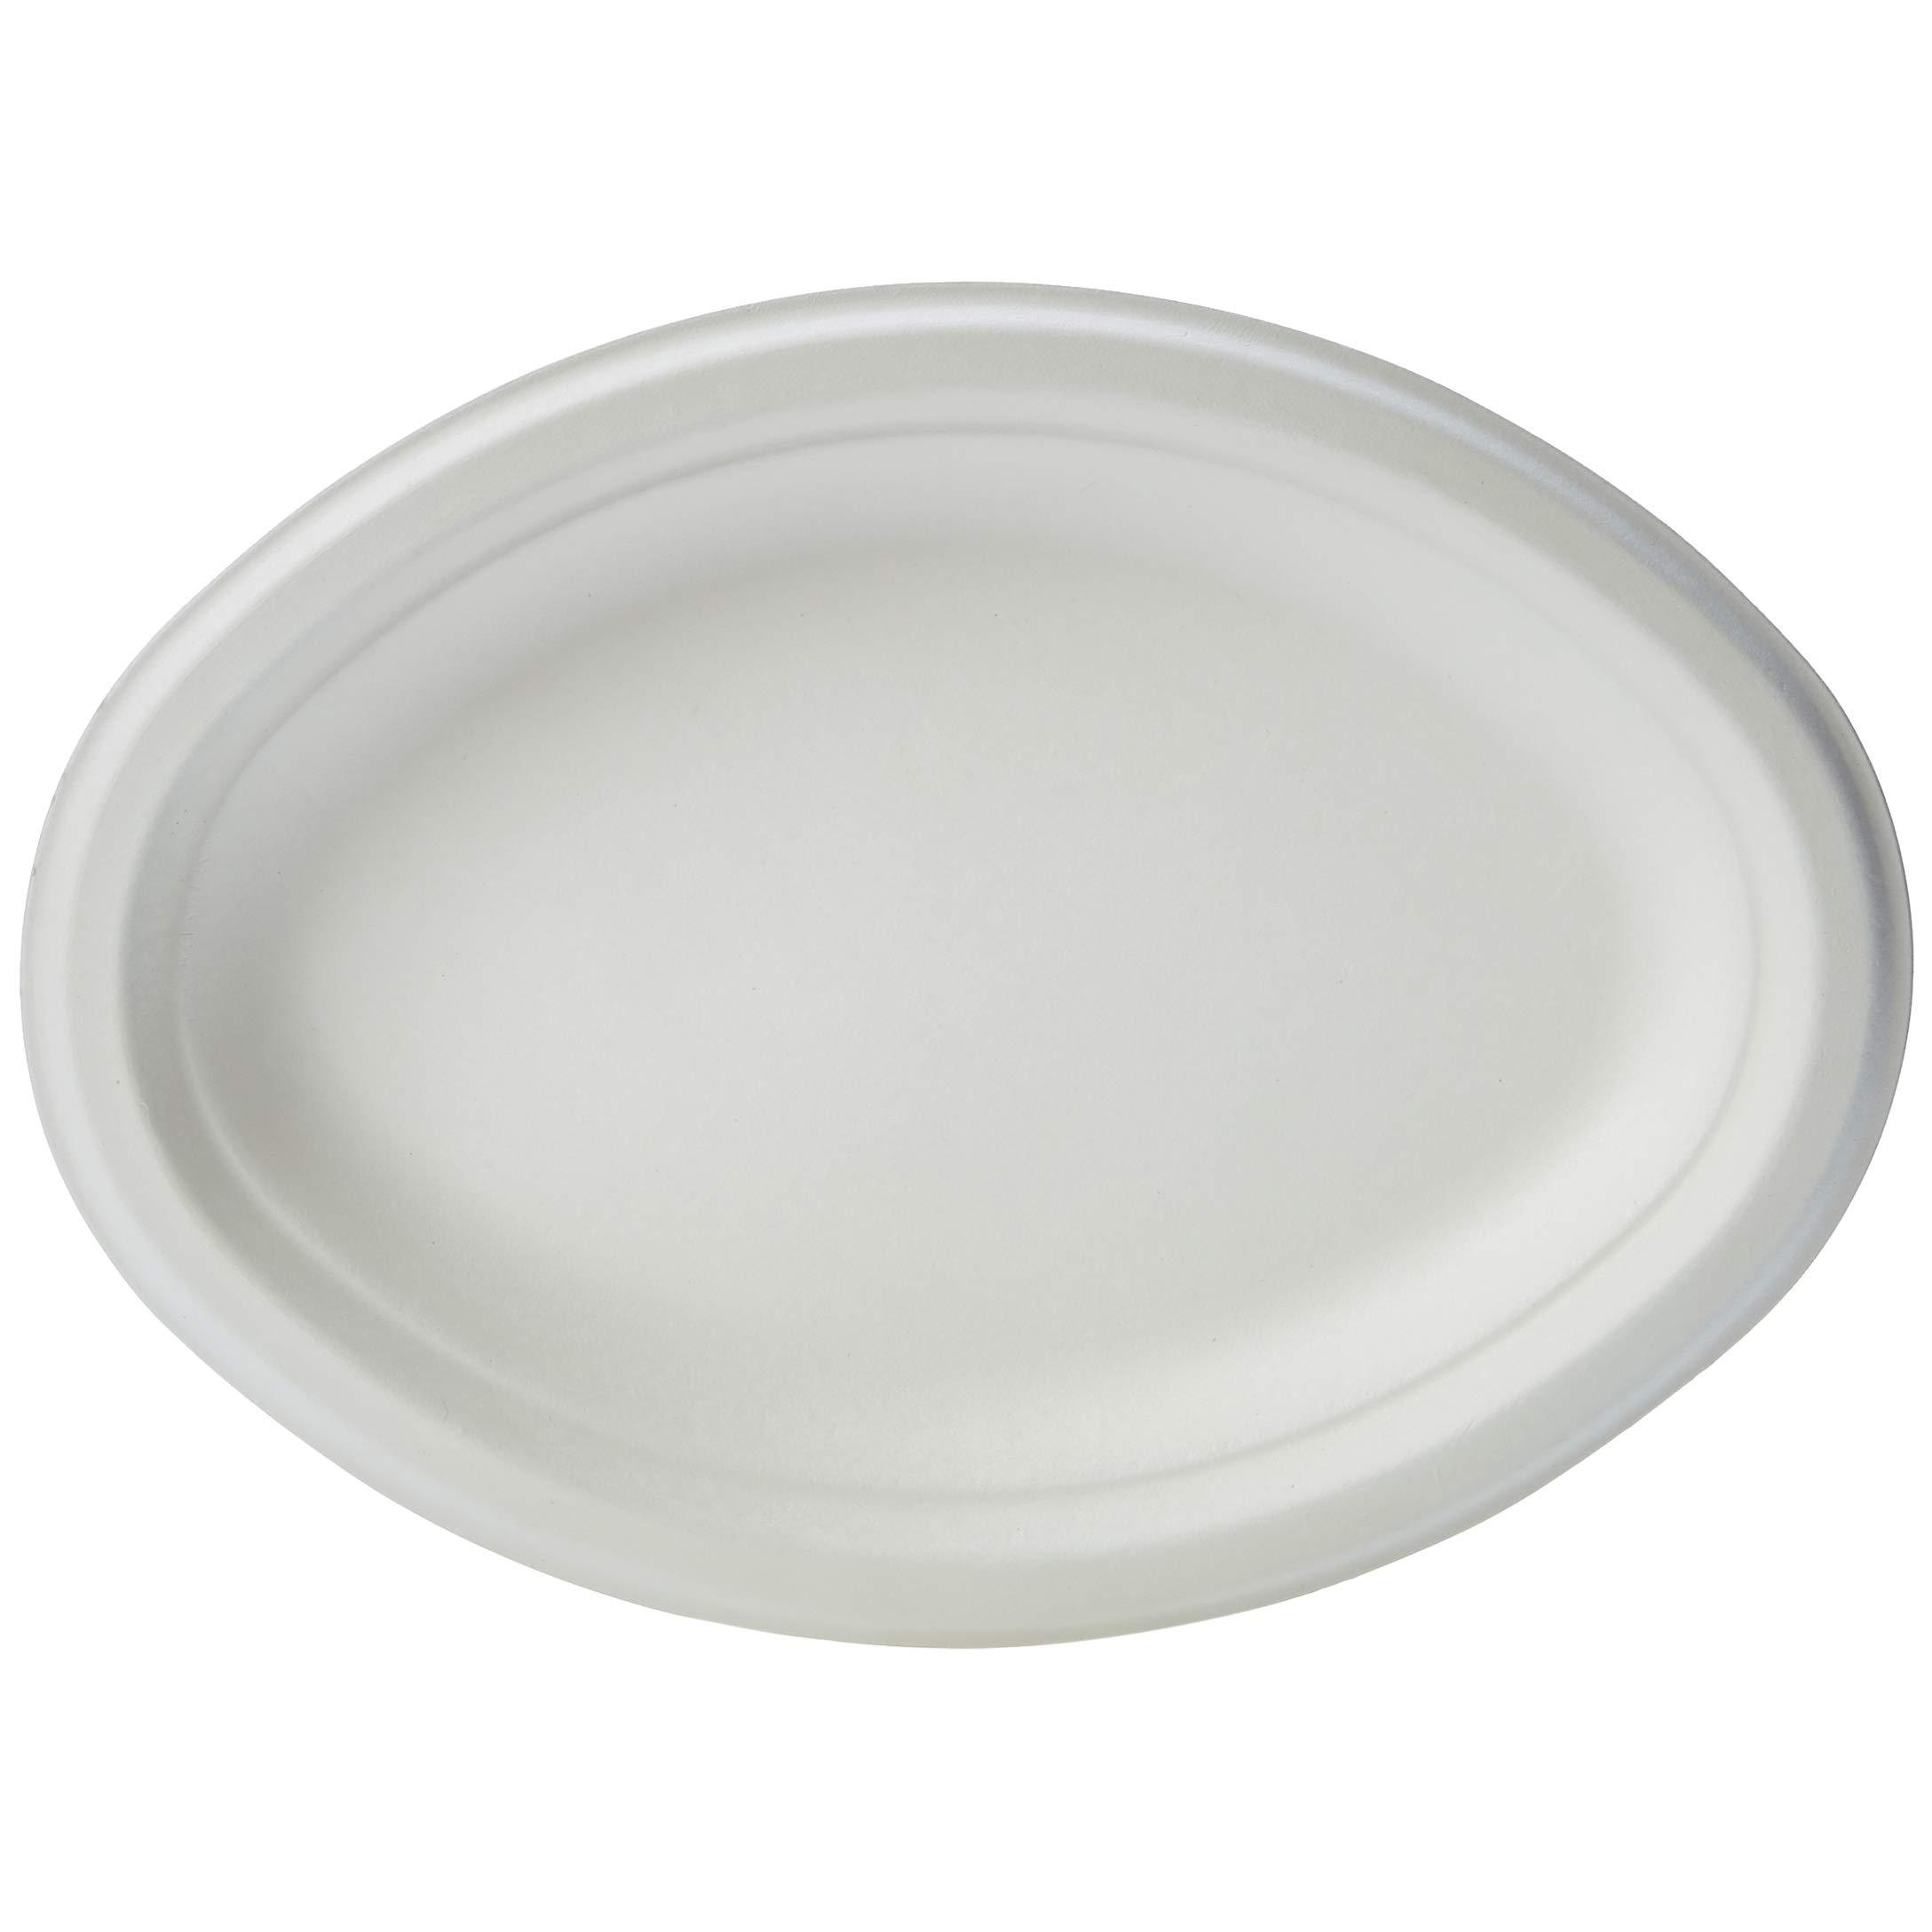 251 & Bulk Disposable Plates: Amazon.com